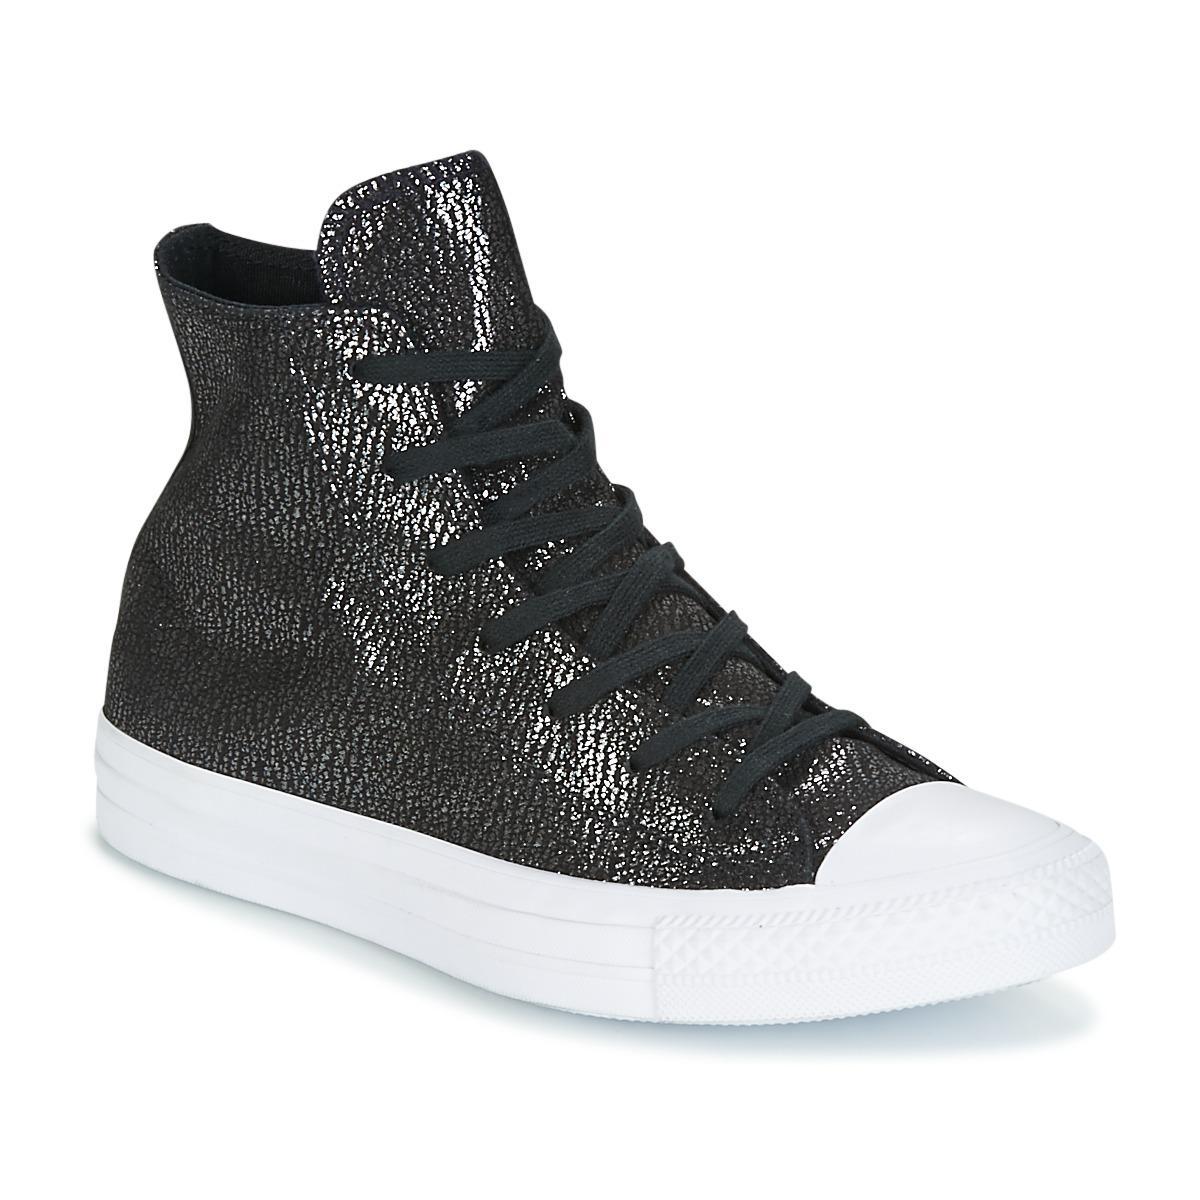 Converse Chuck Taylor All Star Hi Tipped Metallic Women s Shoes ... 940d6433b